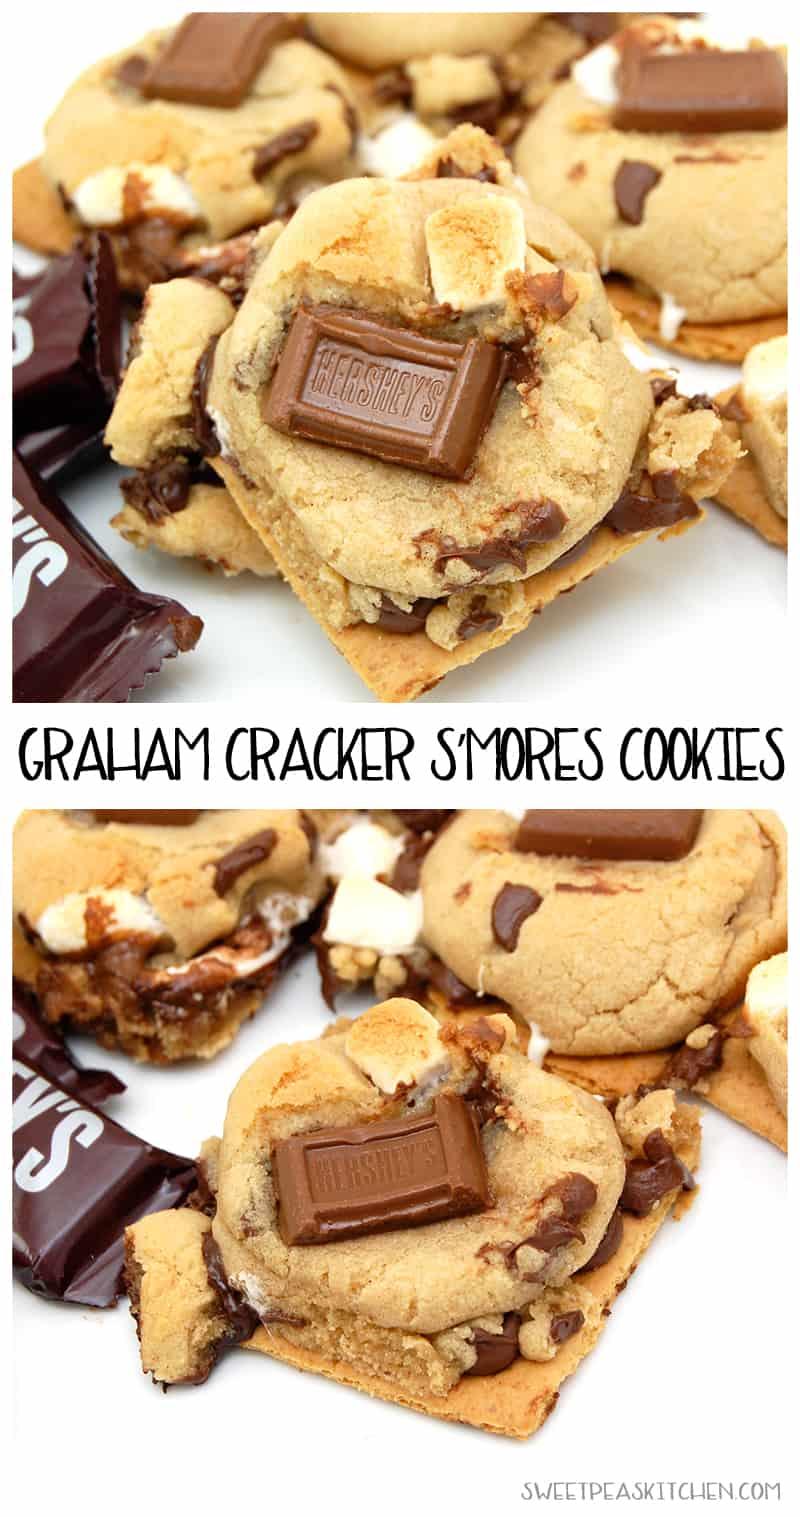 Graham Cracker S'mores Cookies Recipe - PIN Description